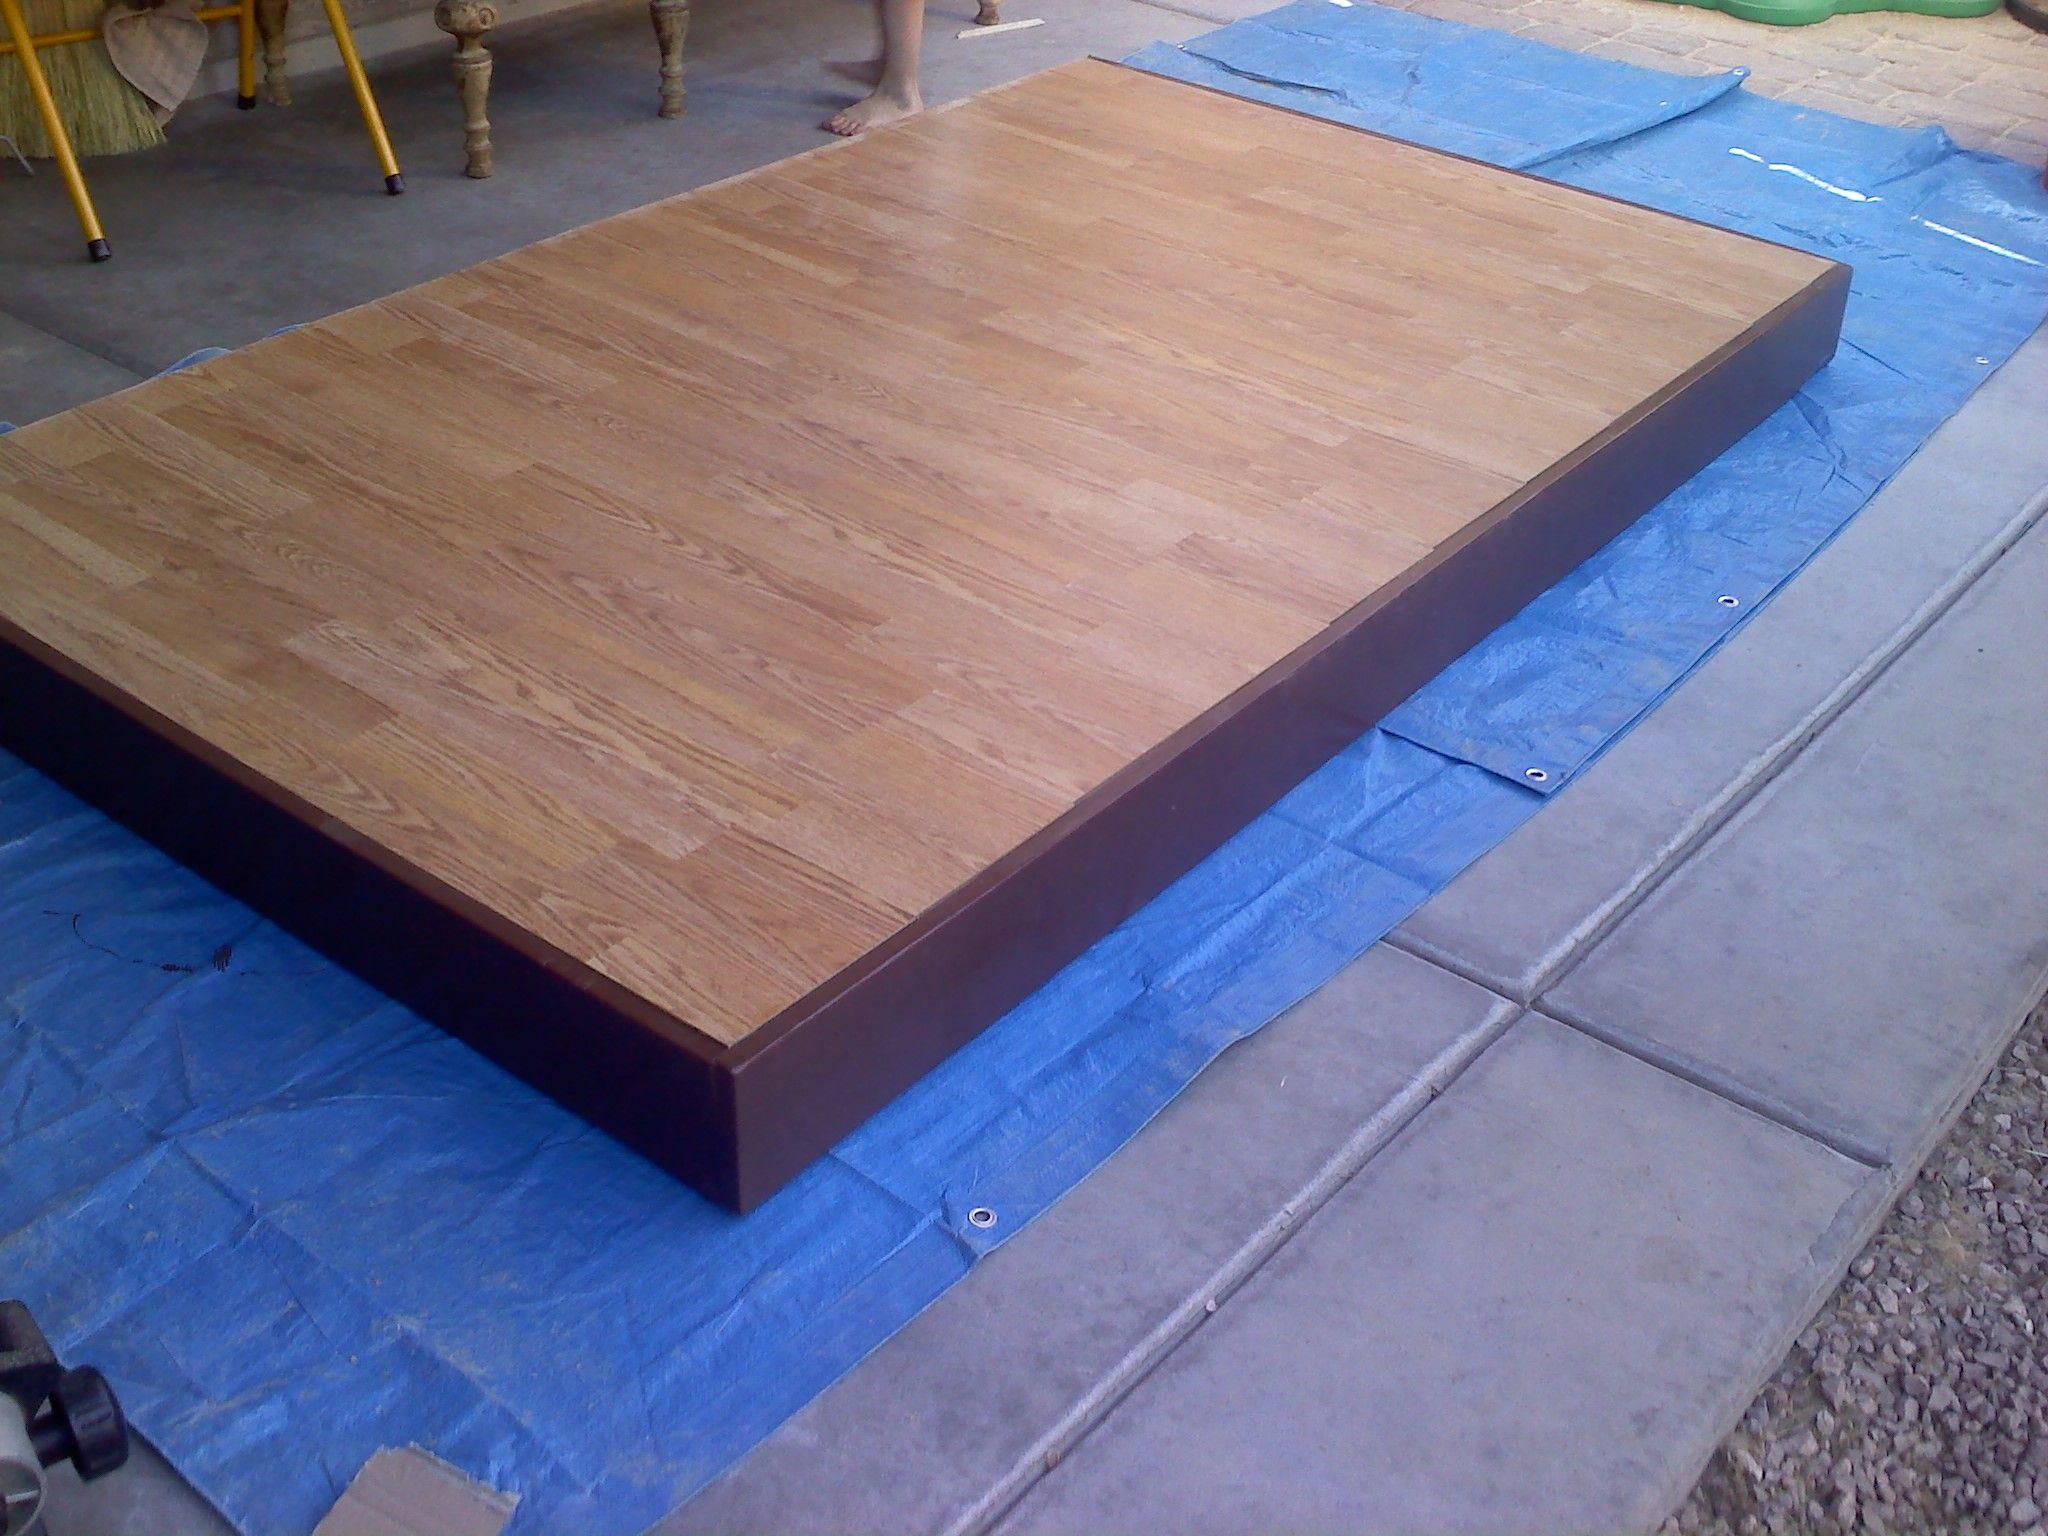 Dance Floor Out Of 2 Pallets Covered In Laminate Wood Flooring Wide Plank Hardwood Floors Wood Floors Wood Floors Wide Plank